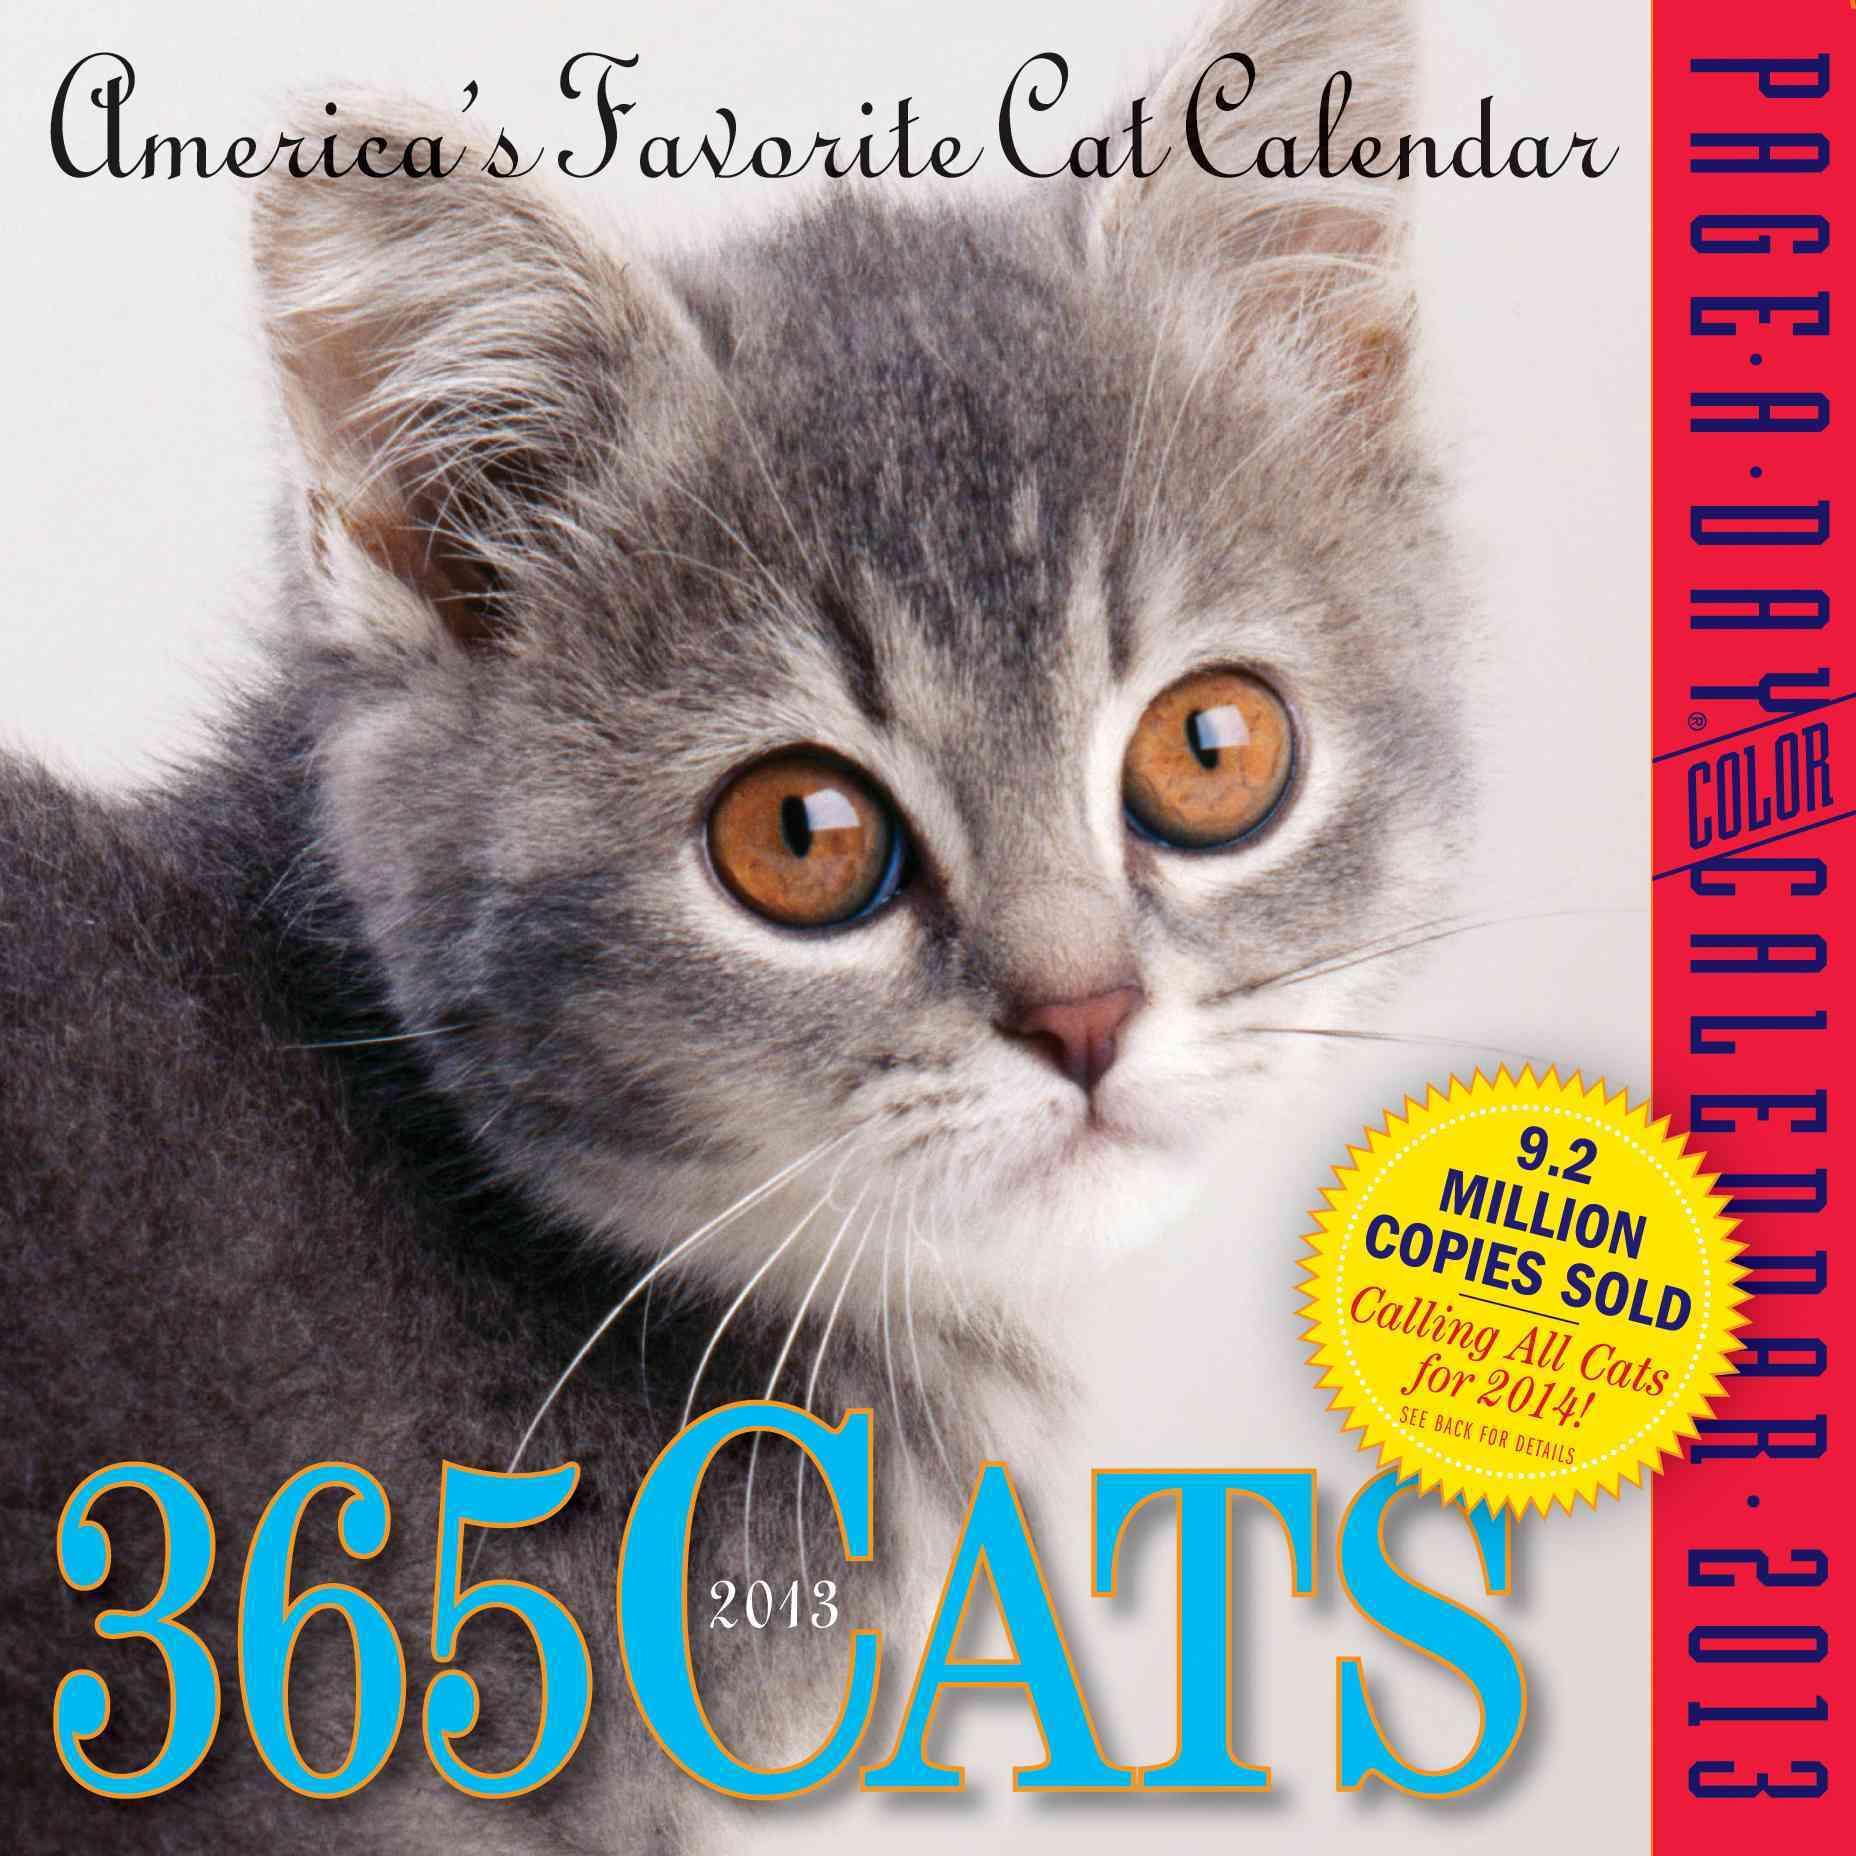 365 Cats Calendar 2013